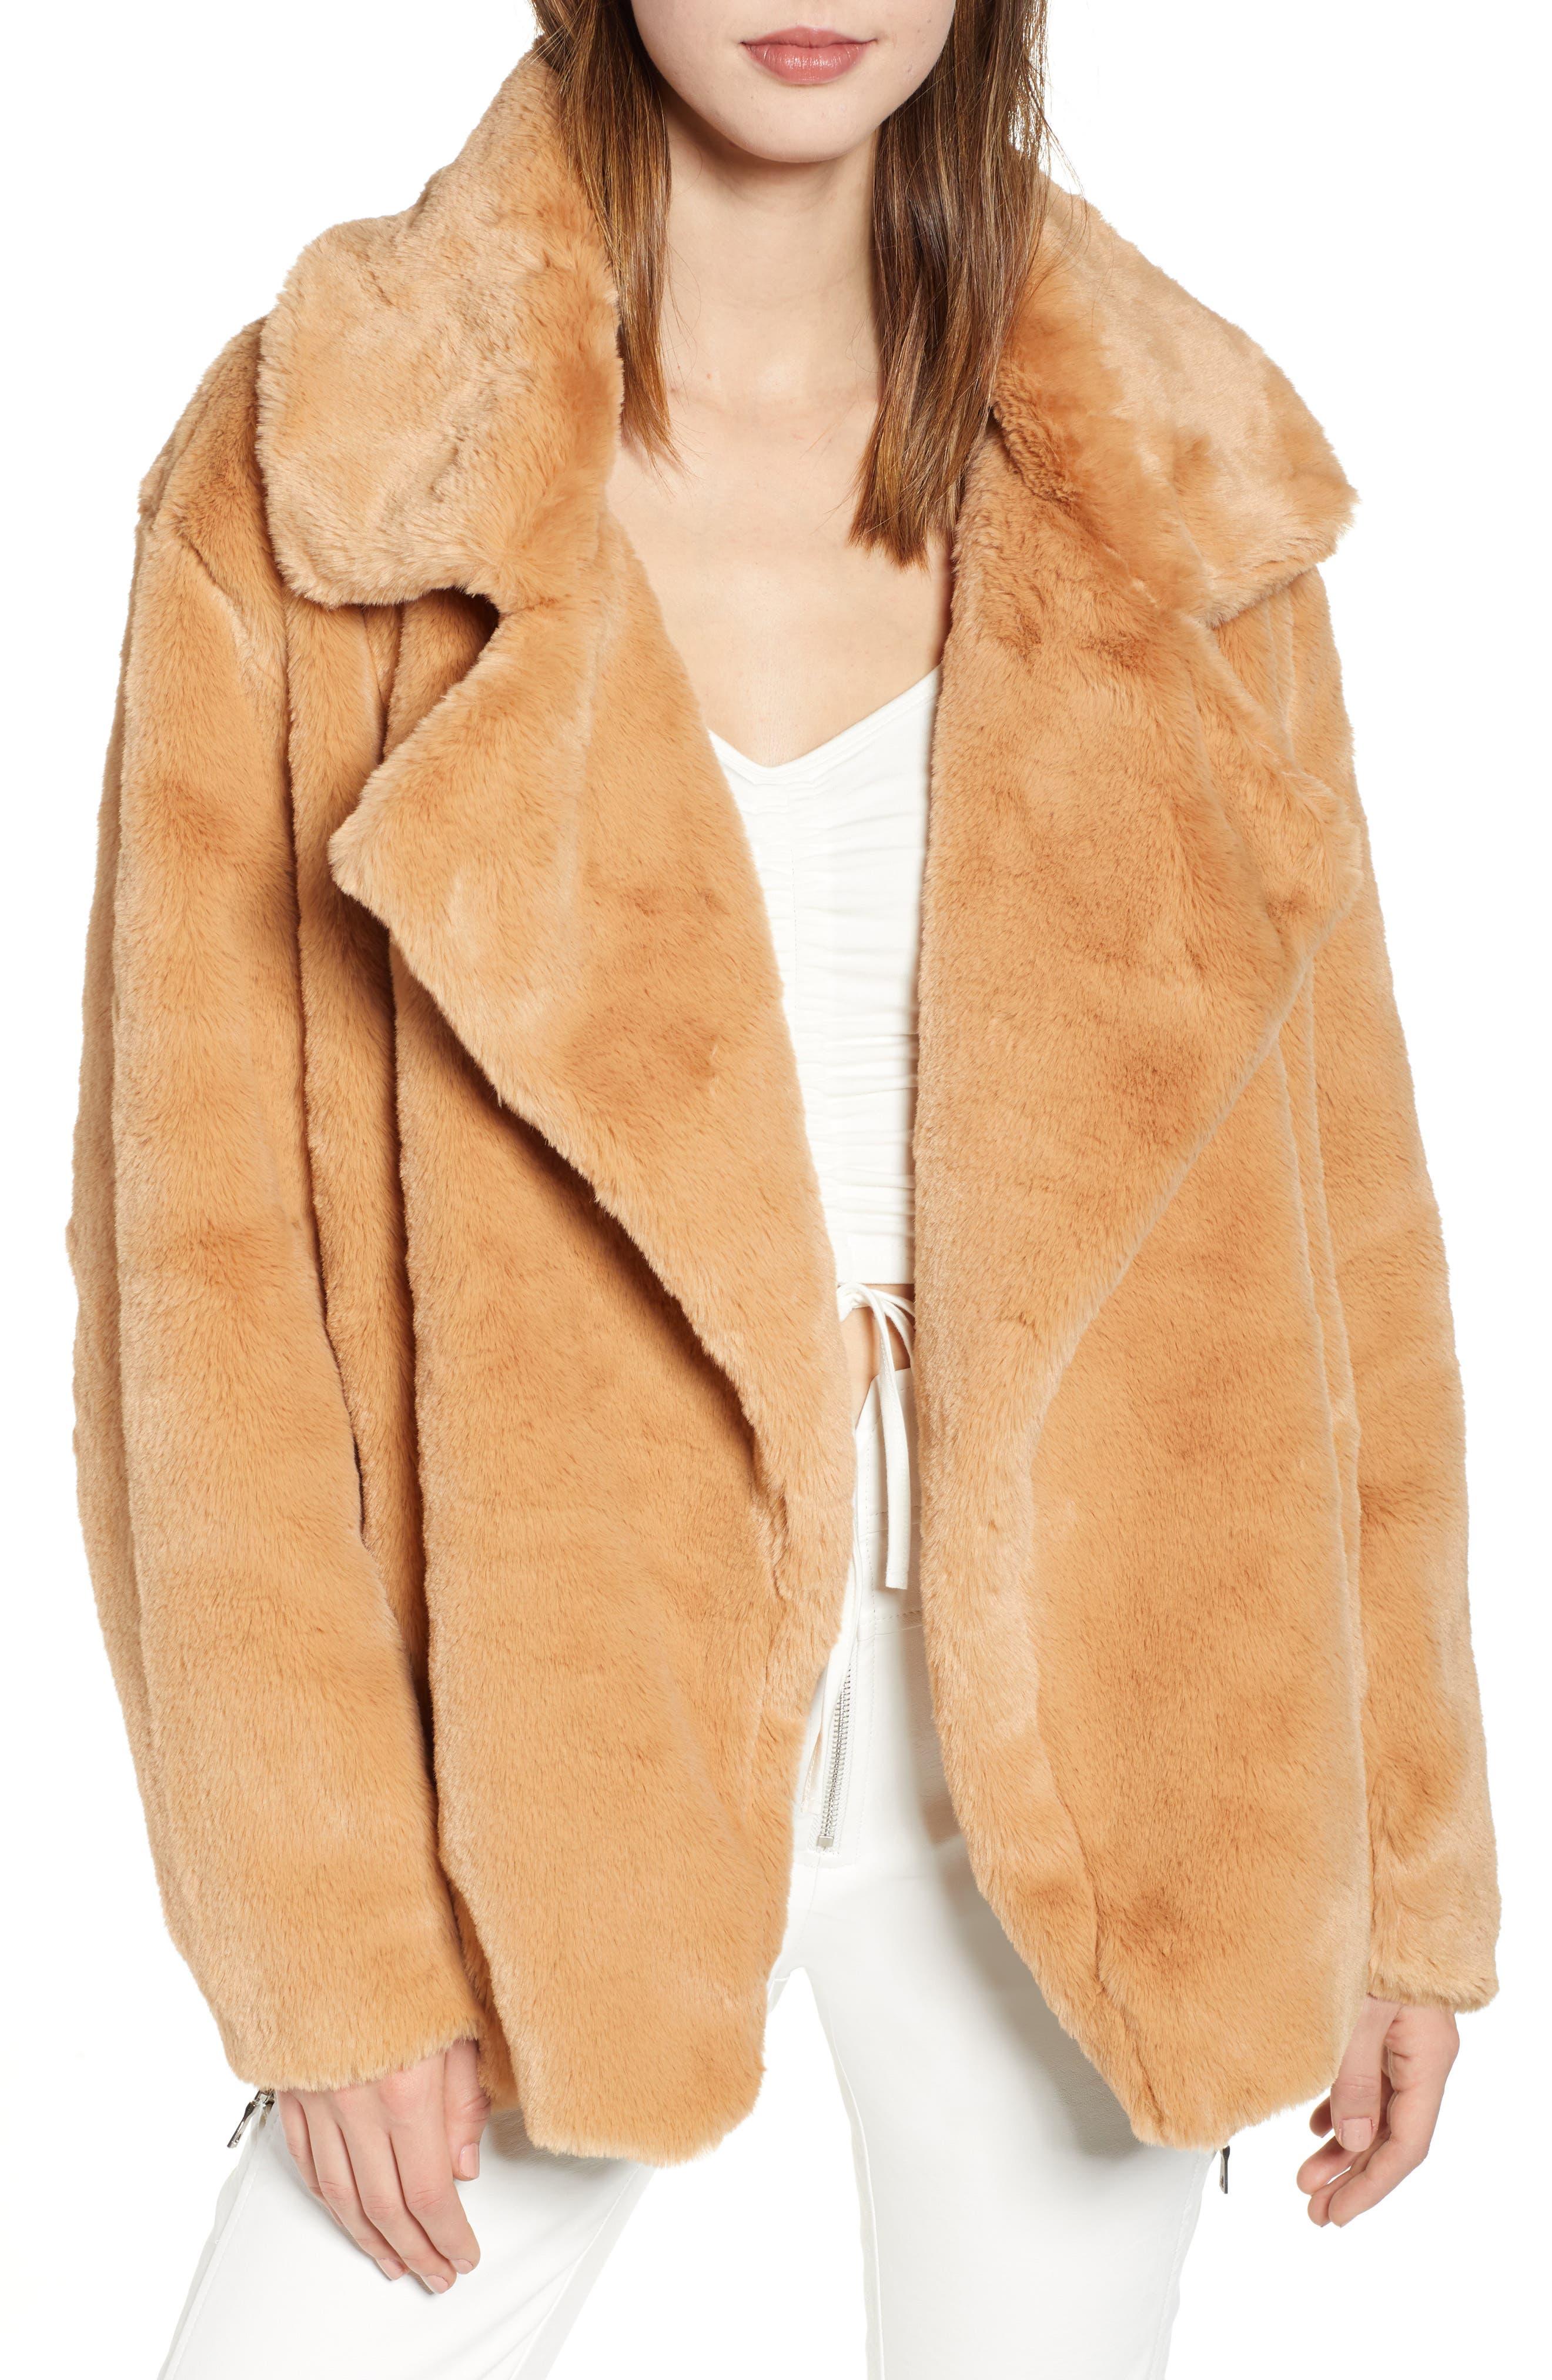 Fawkner Faux Fur Jacket,                         Main,                         color, TAN